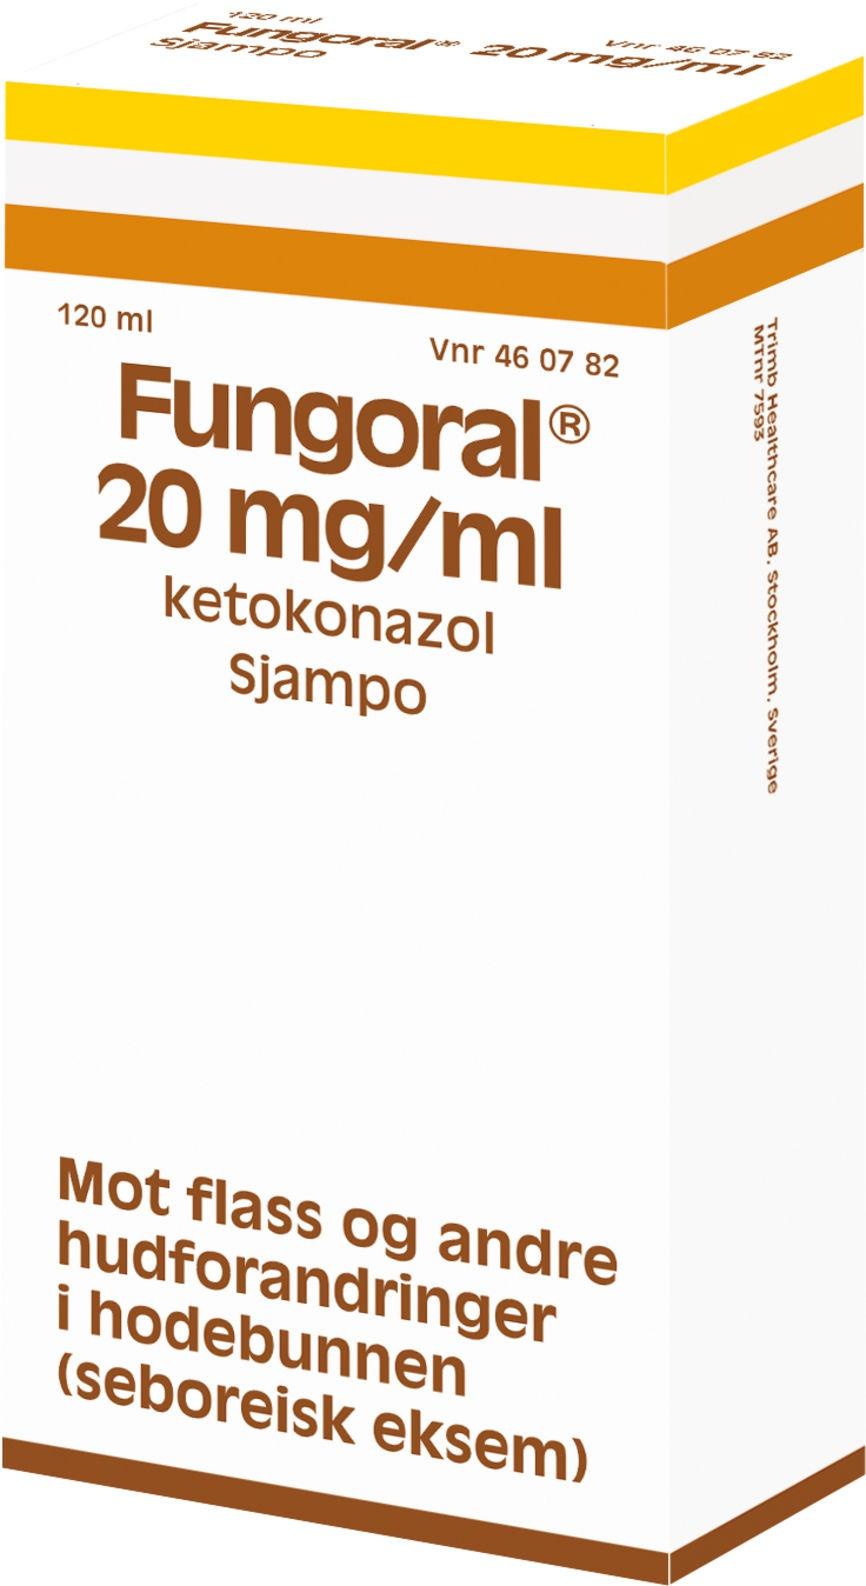 Trimb Healthcare AB Fungoral 20 Mg/Ml Ketoconazole Shampoo